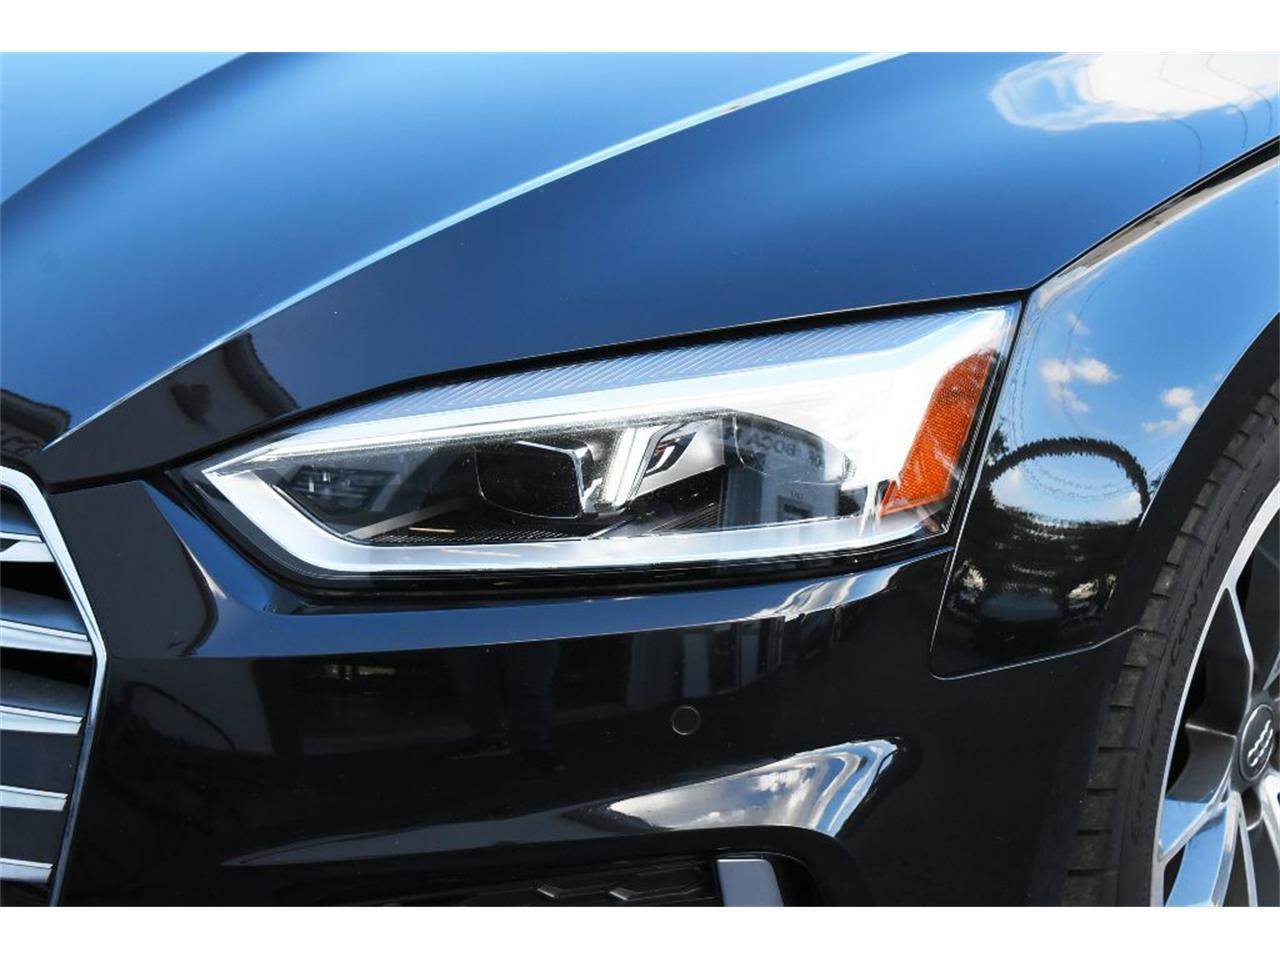 2018 Audi S5 (CC-1422570) for sale in Boca Raton, Florida